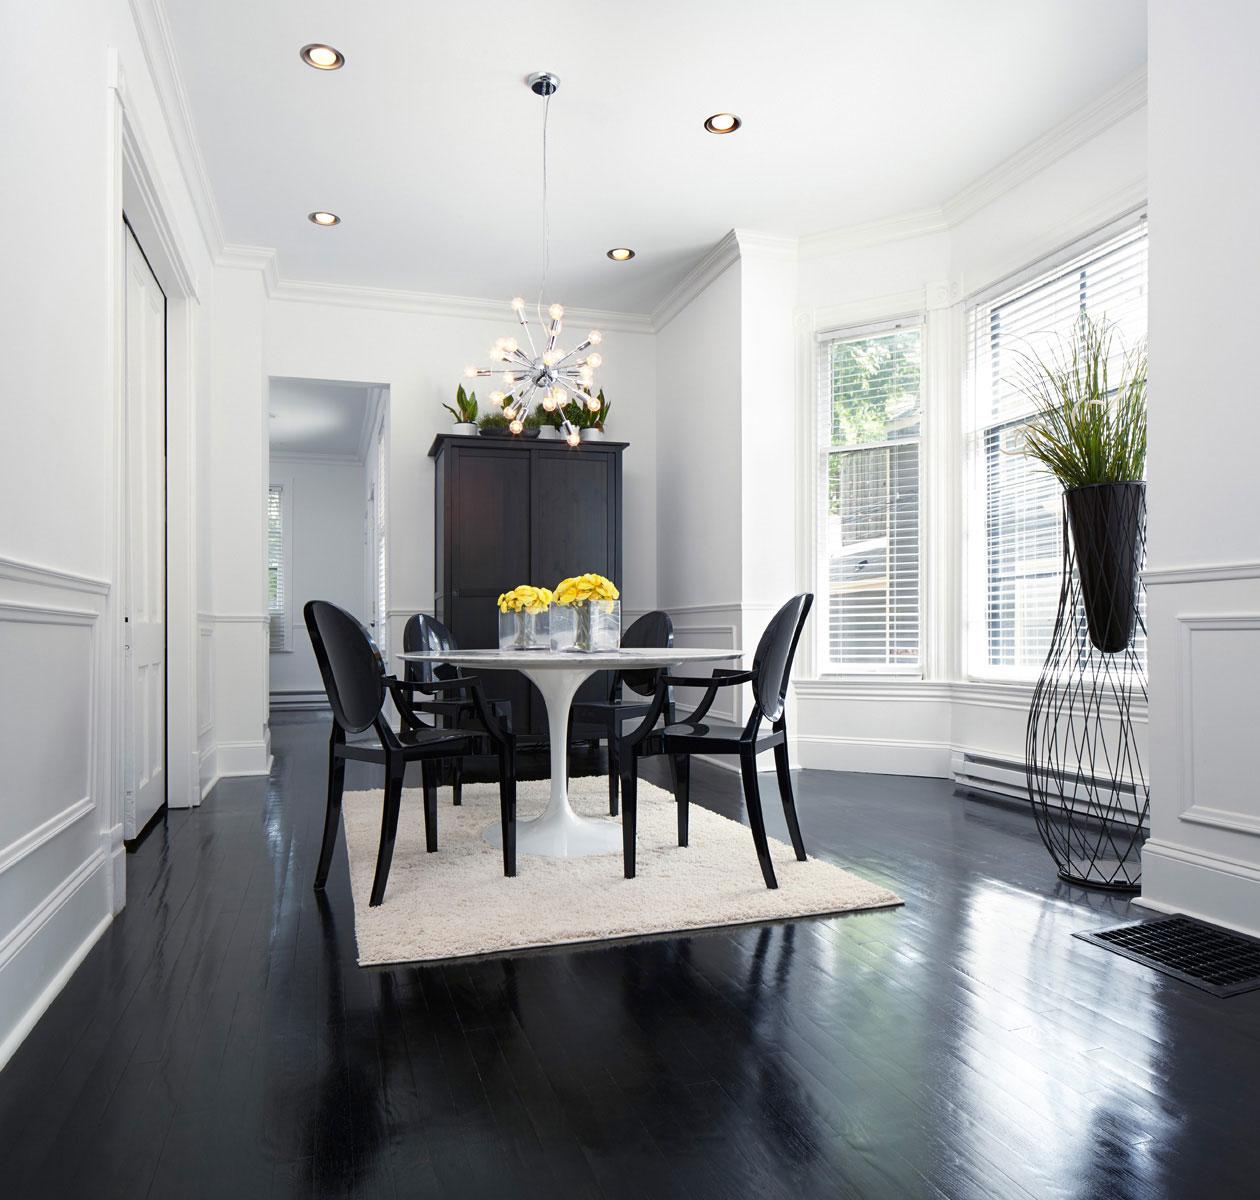 minneapolis-st-paul-home-decor-interior-designer-interior-stylist-interior-design-17.jpg